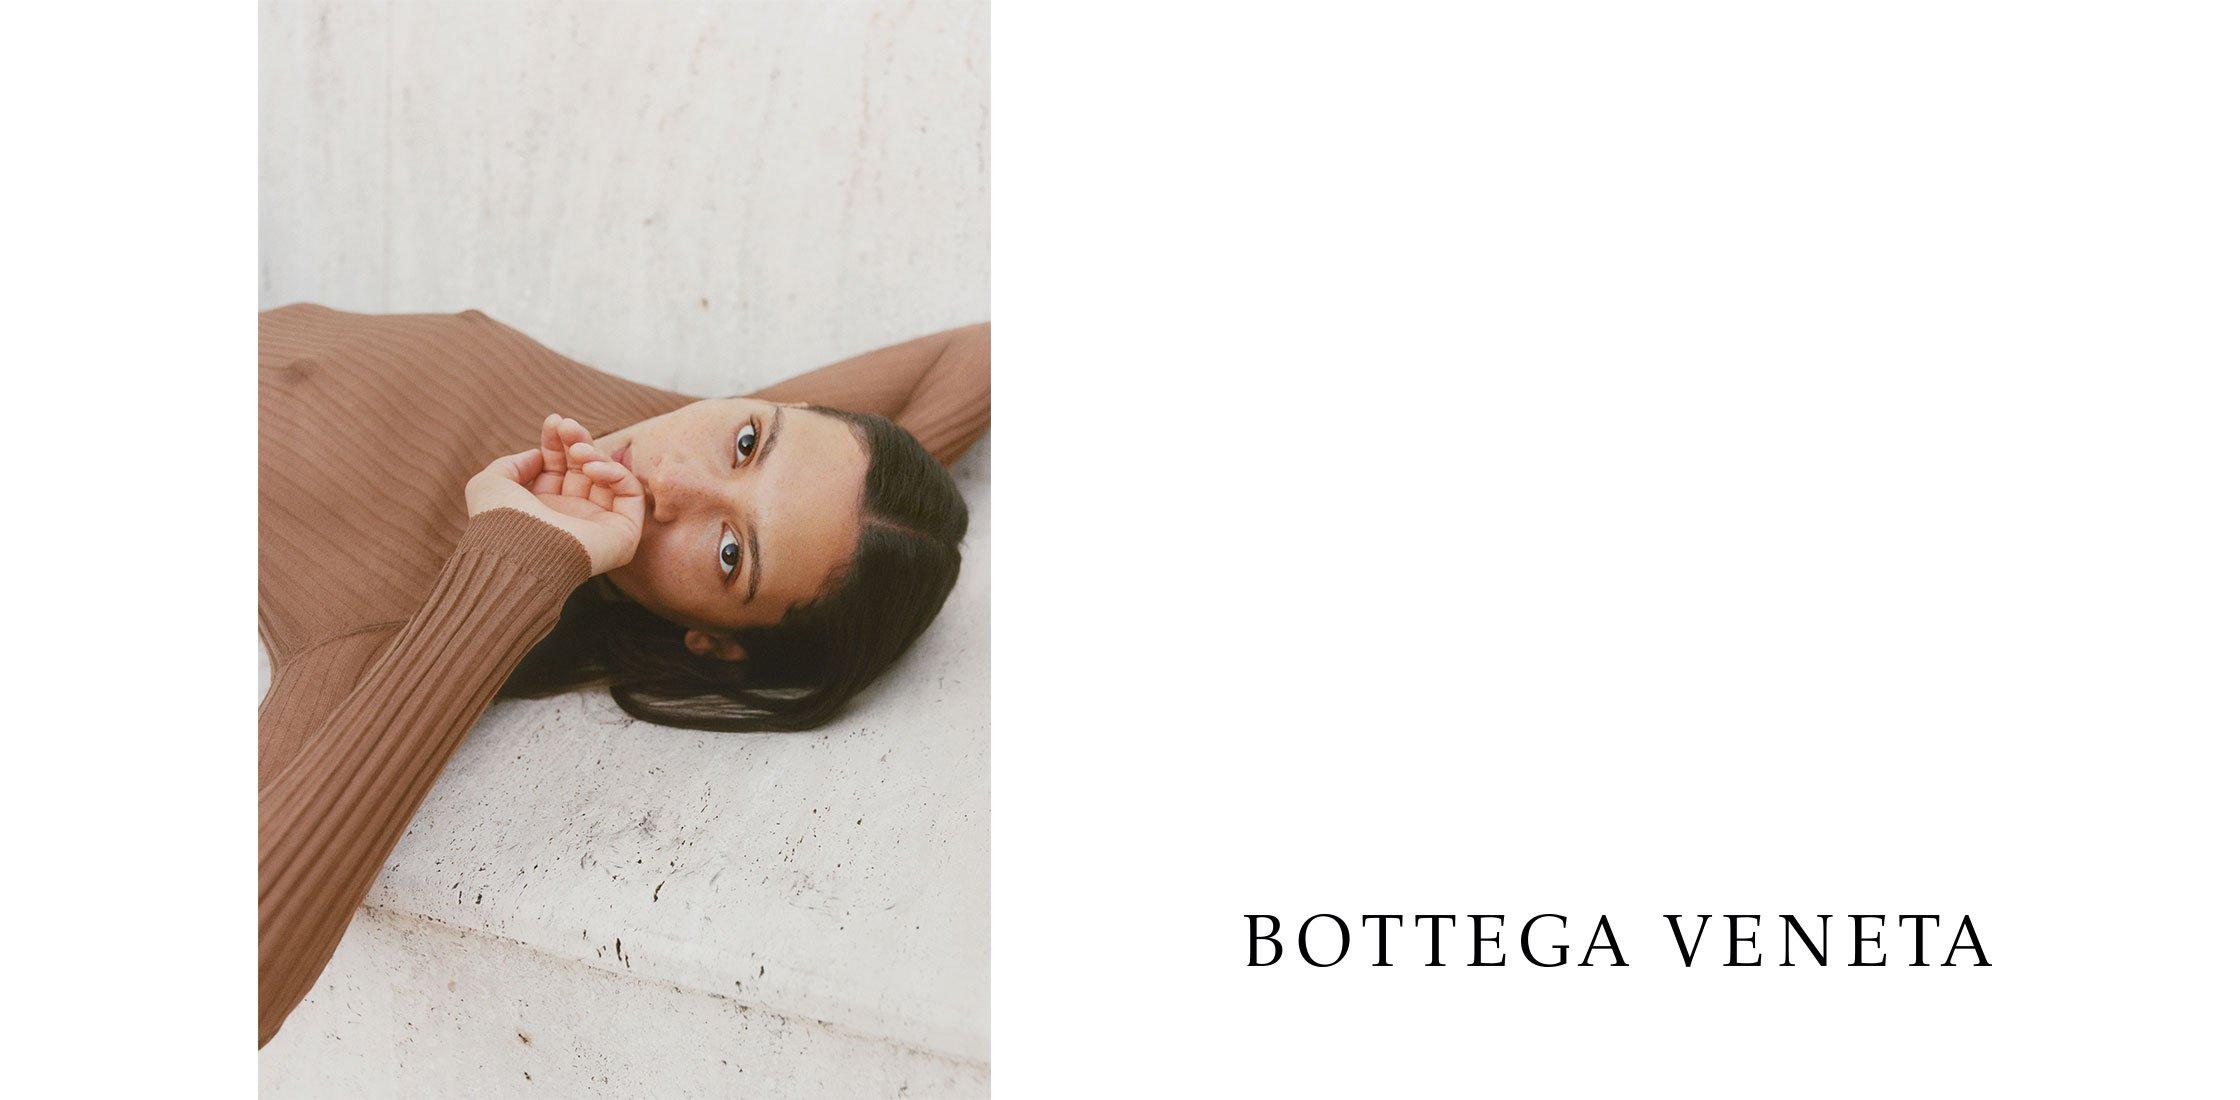 Bottega Veneta весна-лето 2019